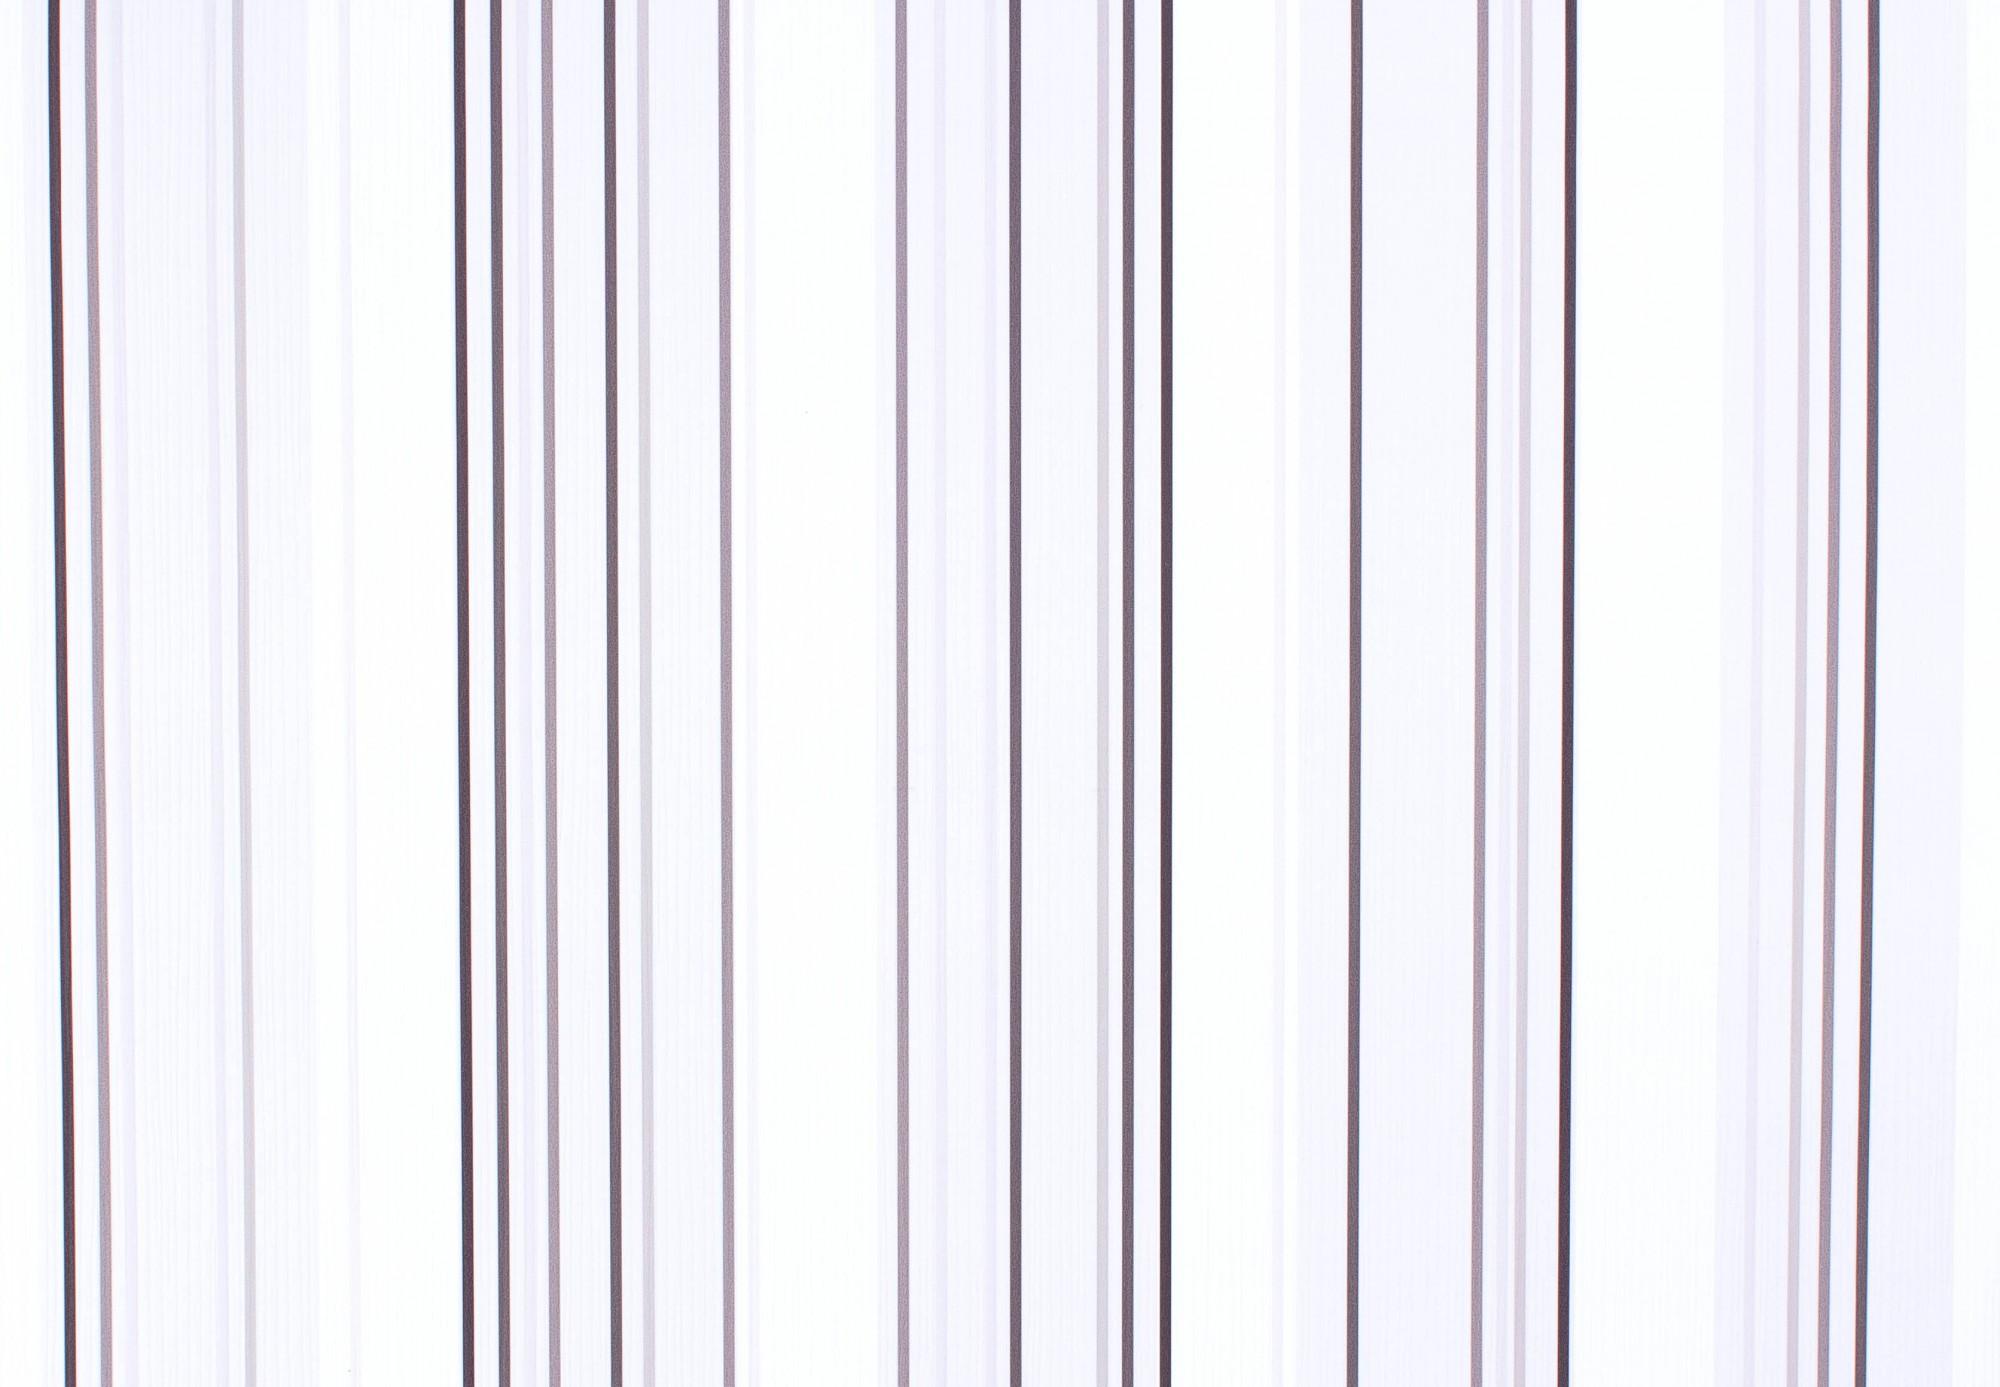 Tapete Esprit Home 9 Papiertapete 94153 2 941532 Streifen Grau